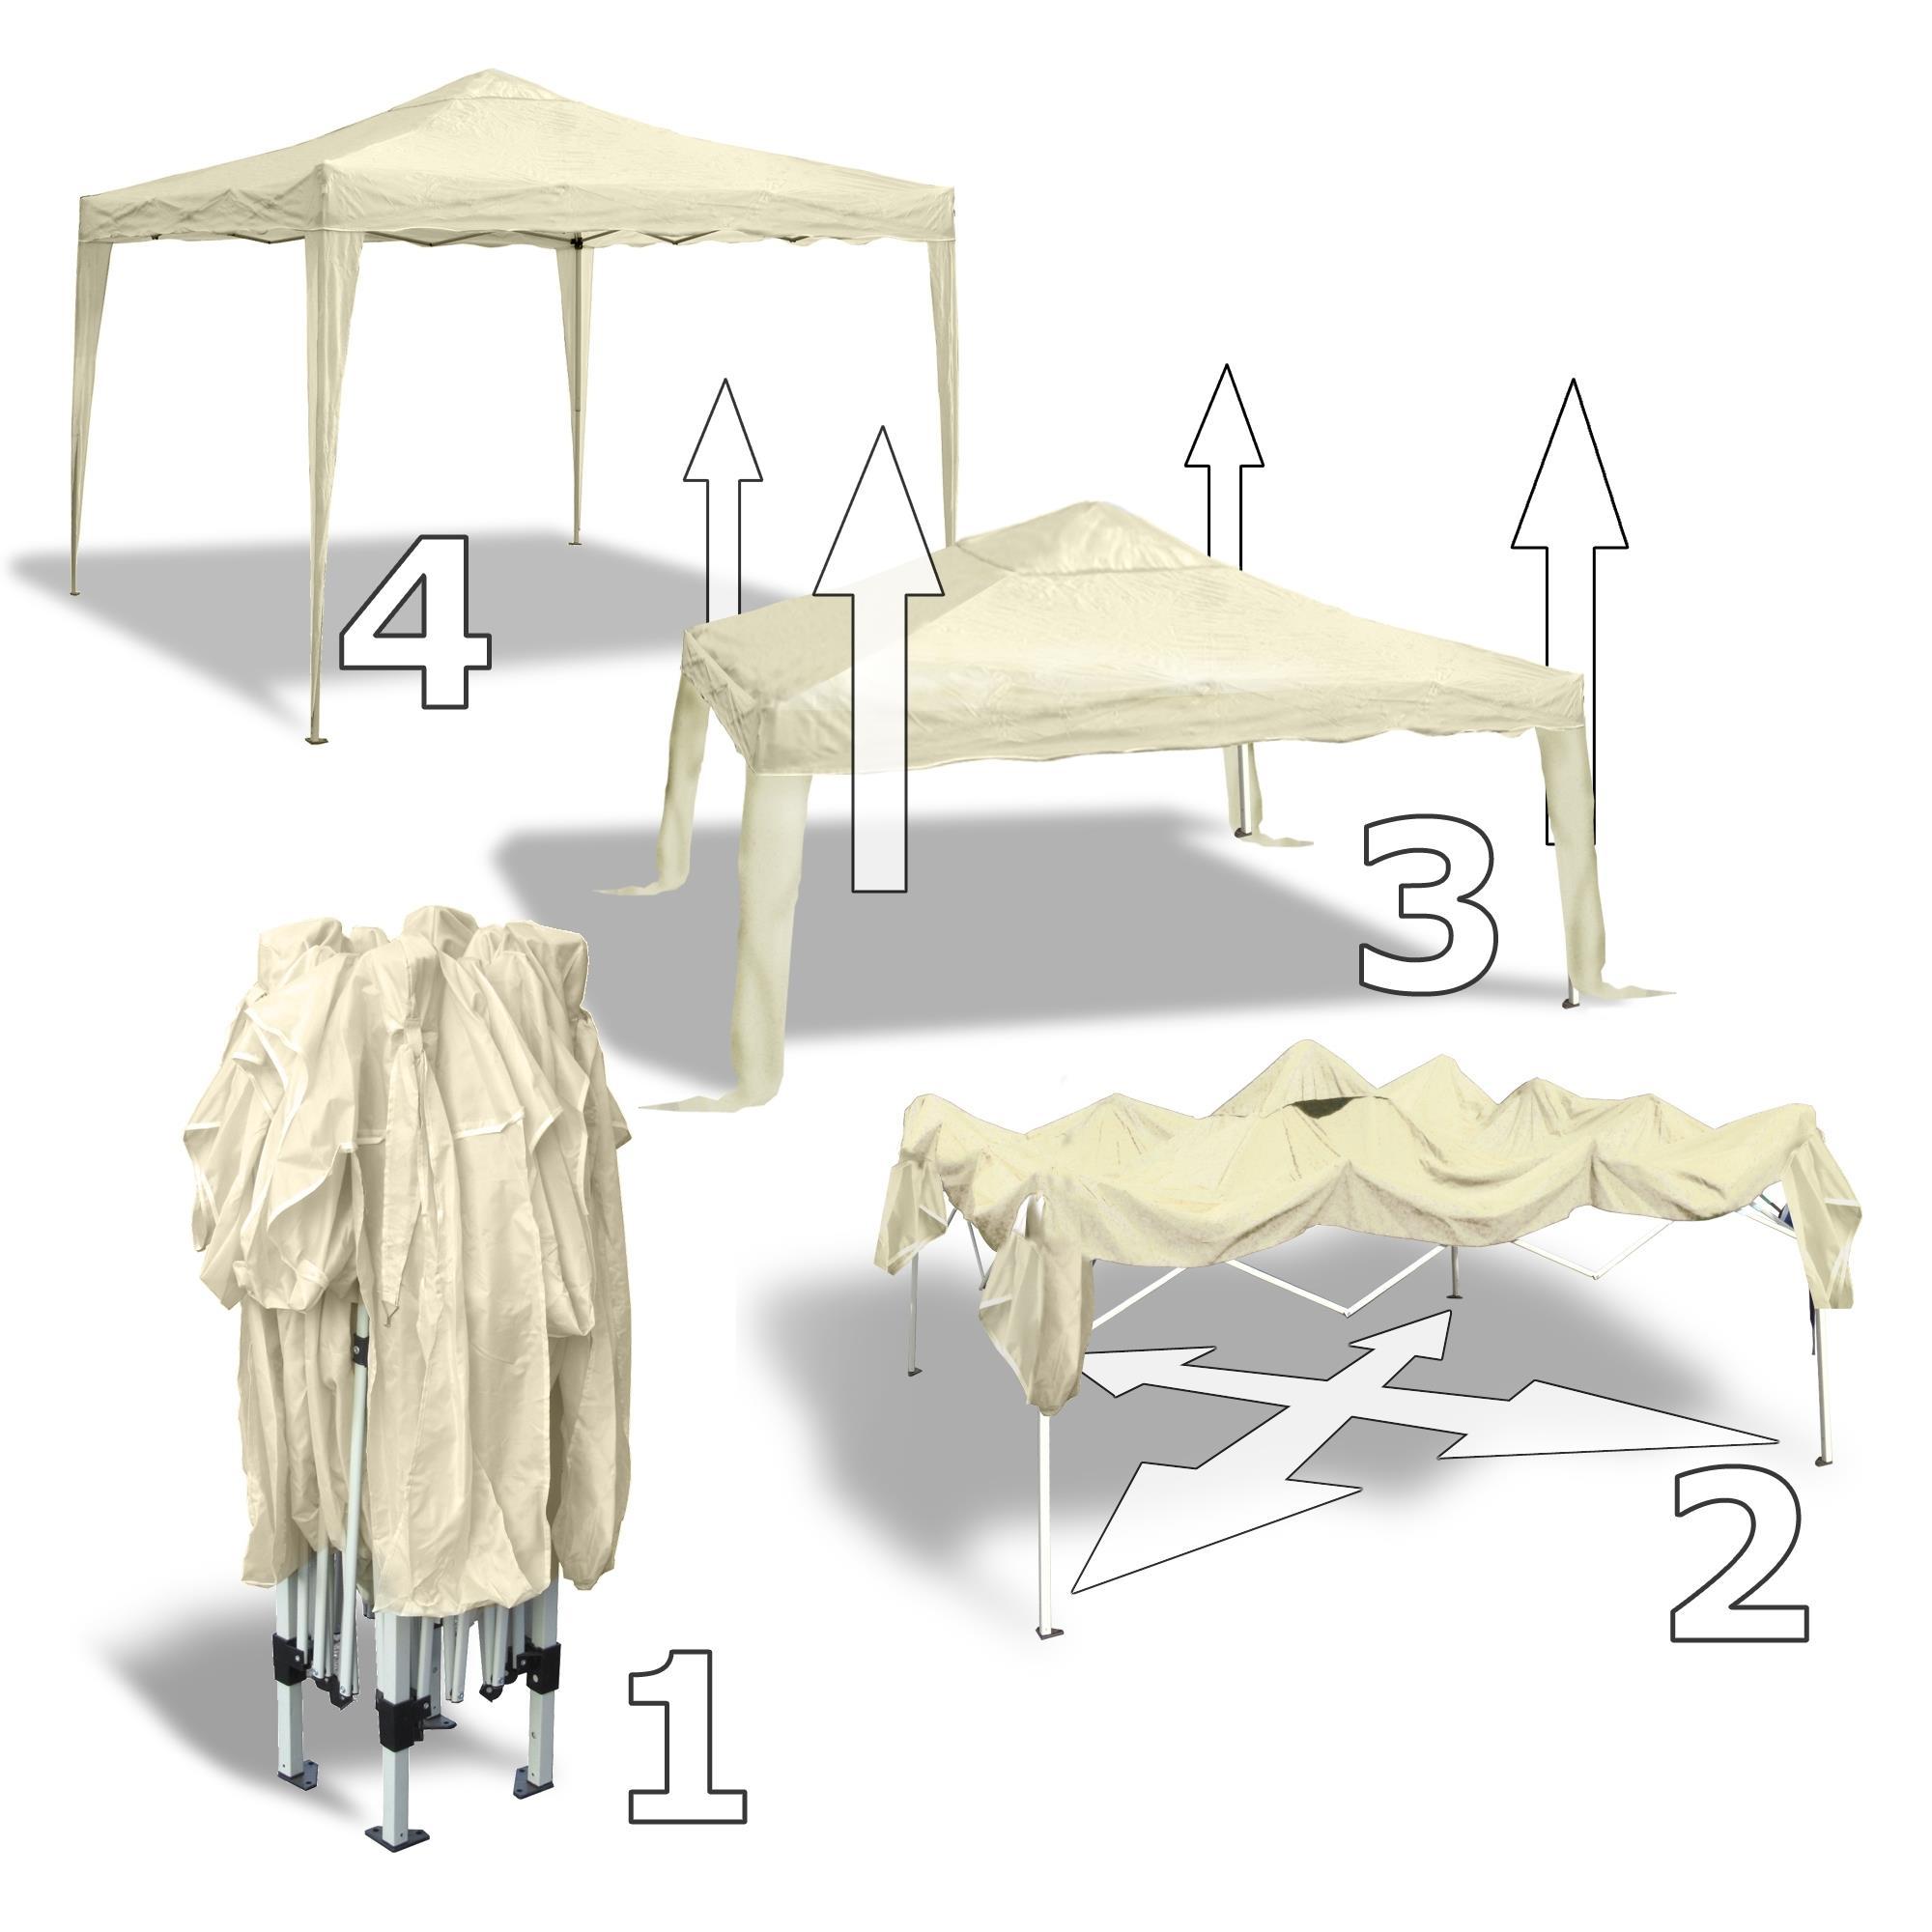 gartenpavillon wasserdicht falt pavillon bahama iii bestseller shop. Black Bedroom Furniture Sets. Home Design Ideas